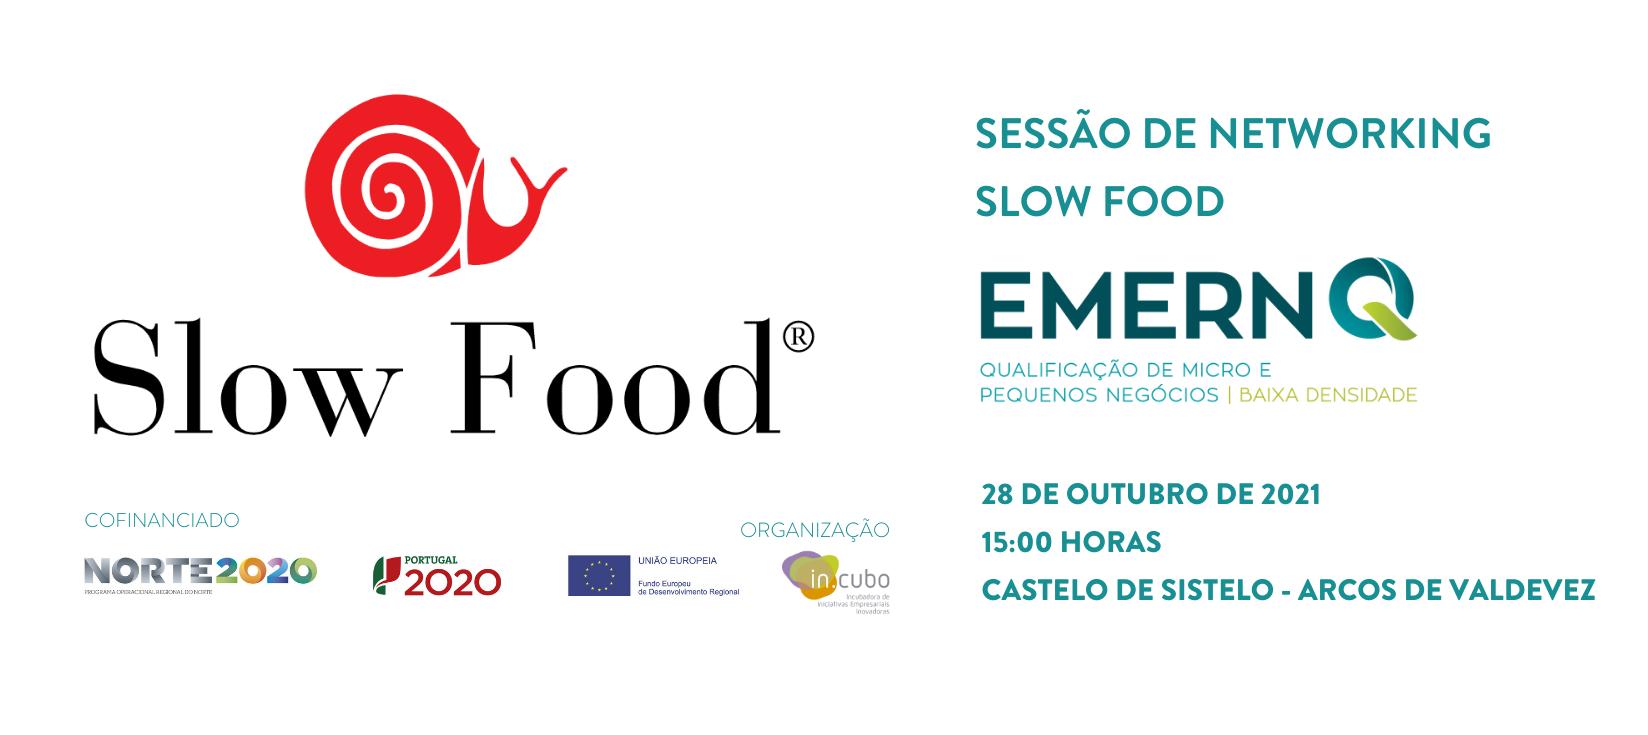 Sessão Networking Slow Food - EMERN-Q